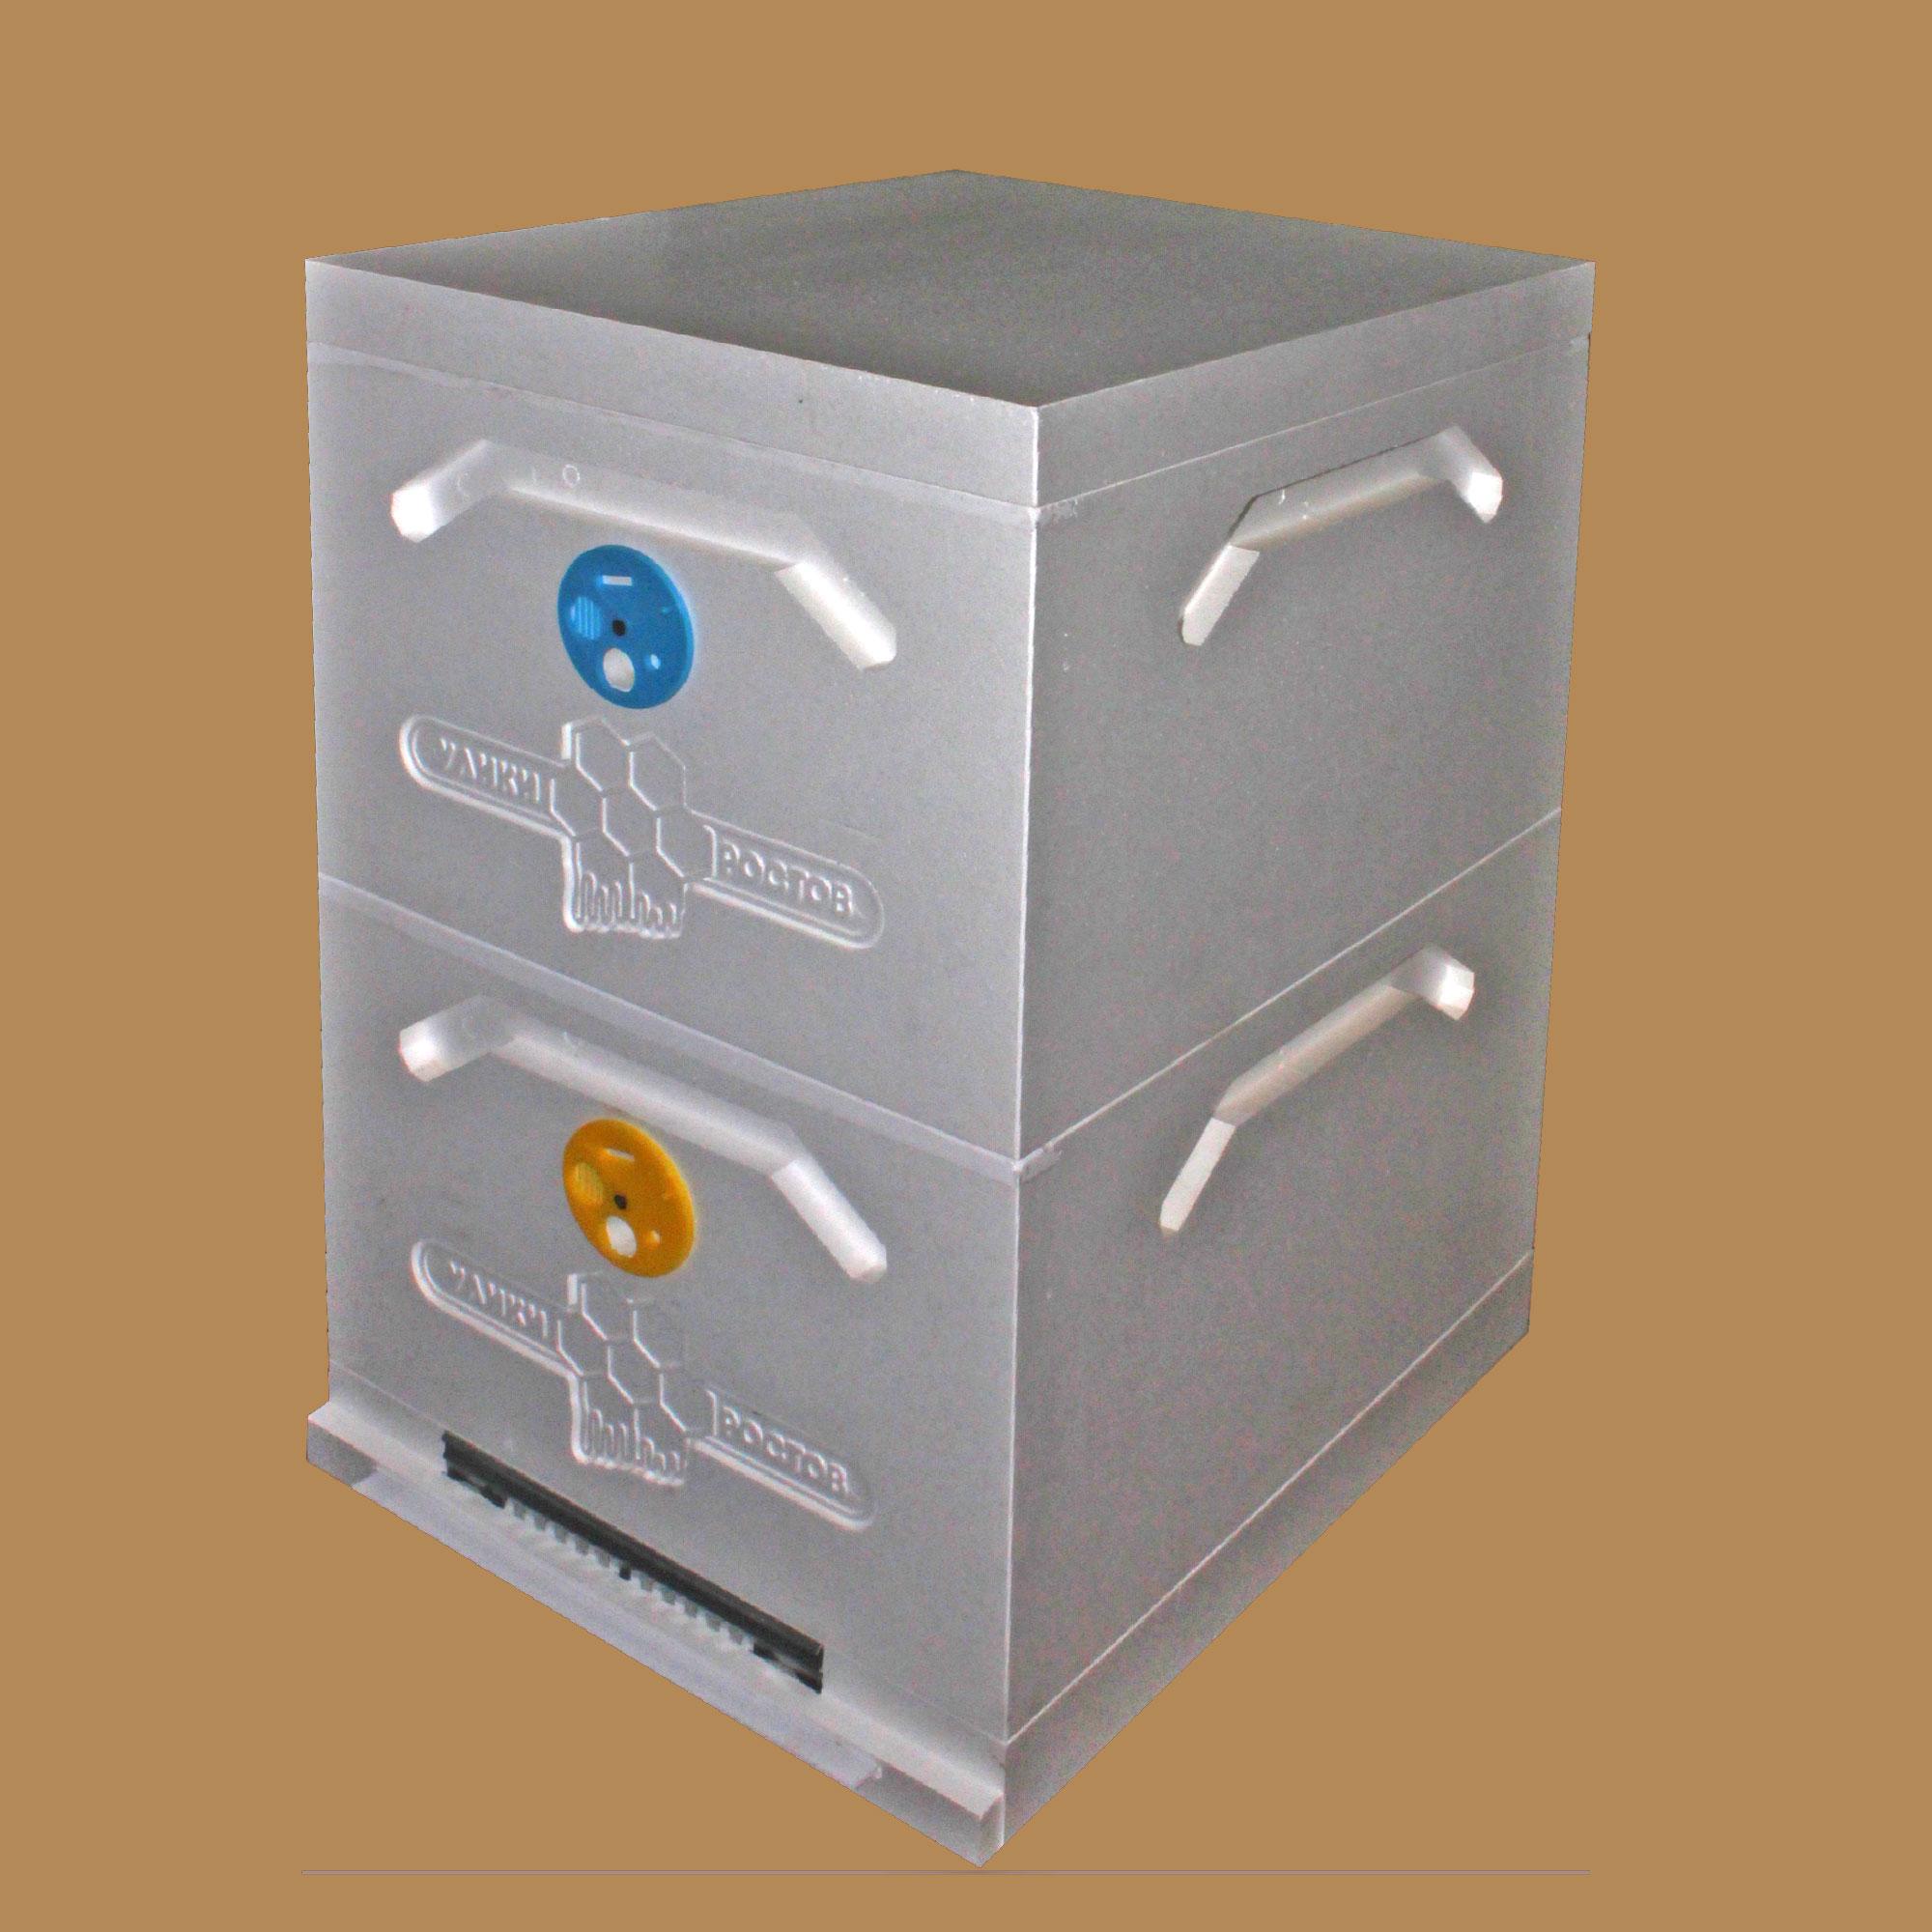 Улей Дадан 2-корпусный 10-рамочный усиленный (Д2-10)